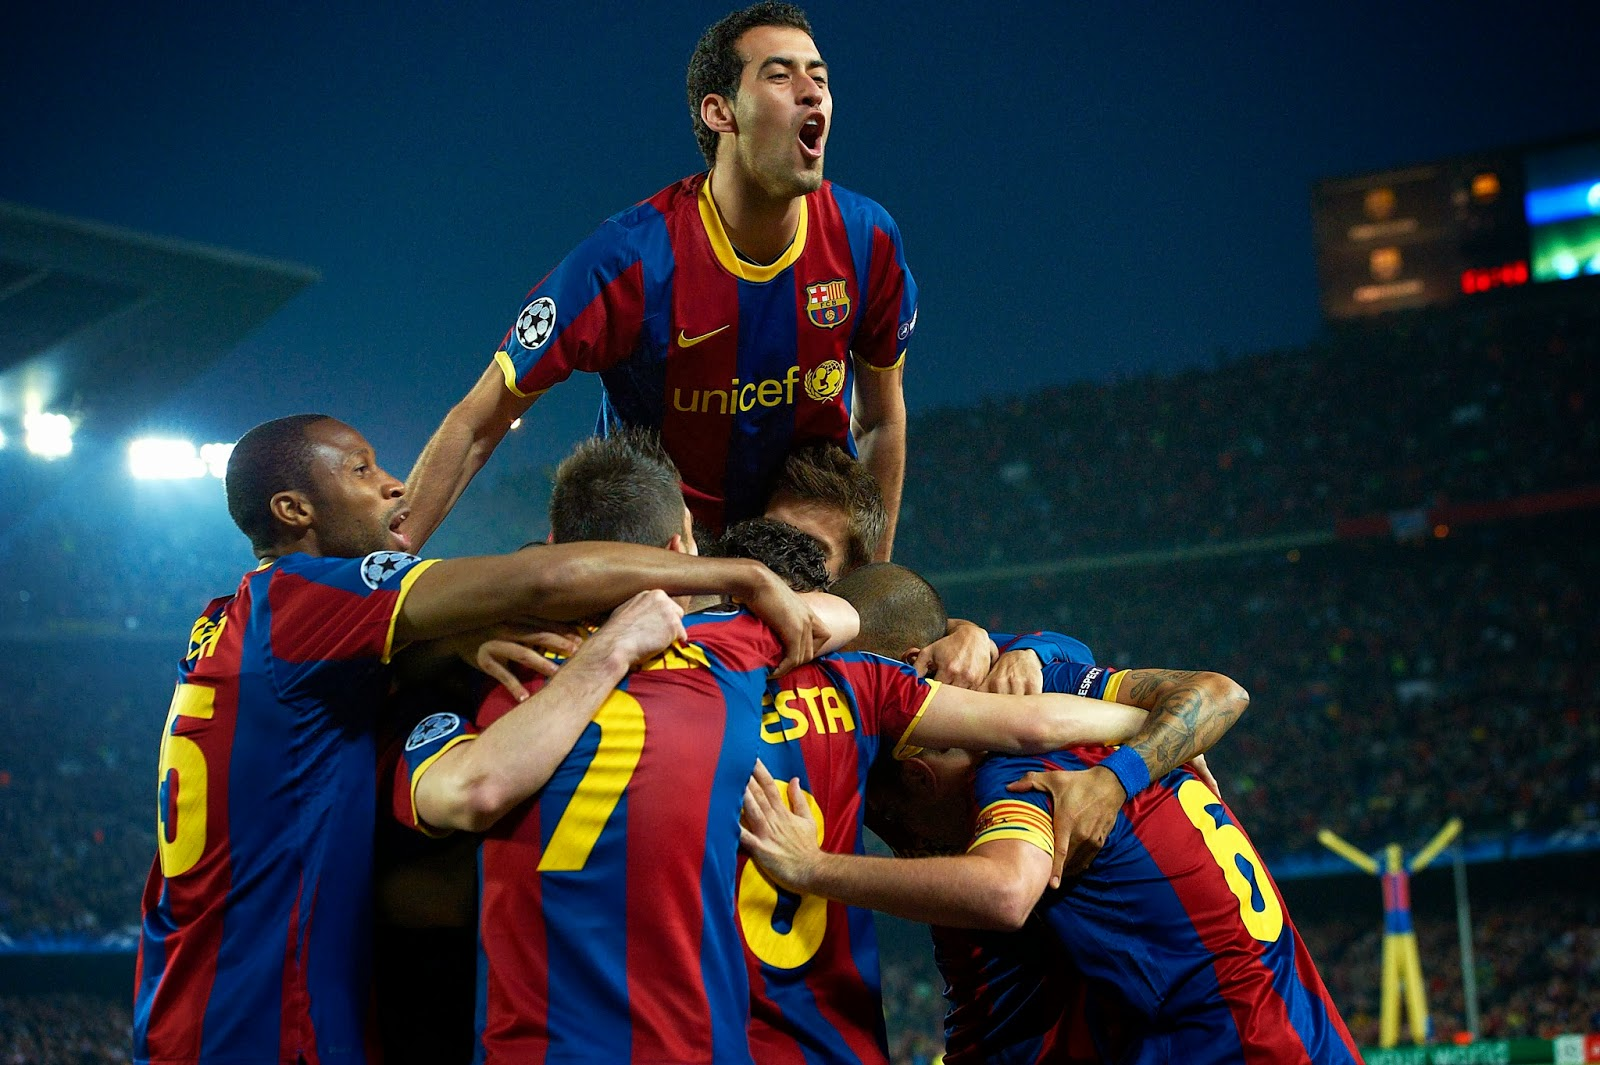 Image Result For Osasuna Barcelona En Vivo Por Internet Gratis